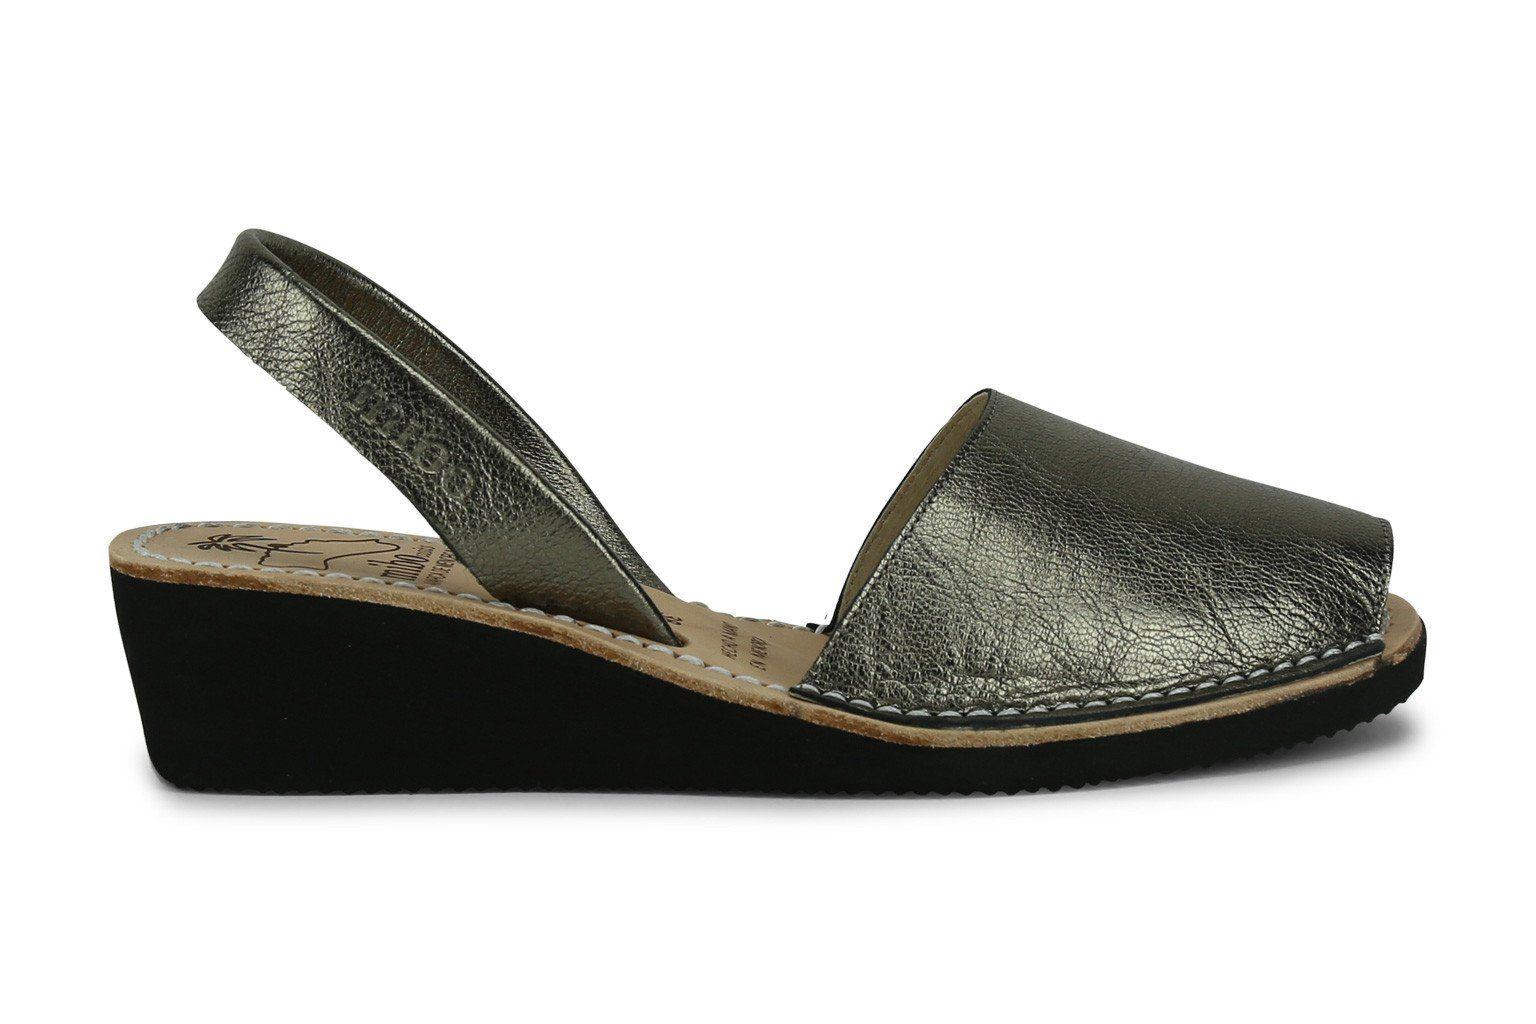 db954b8059a9e Mibo Avarcas Women s Wedges Silver Vintage Leather Slingback Sandals ...